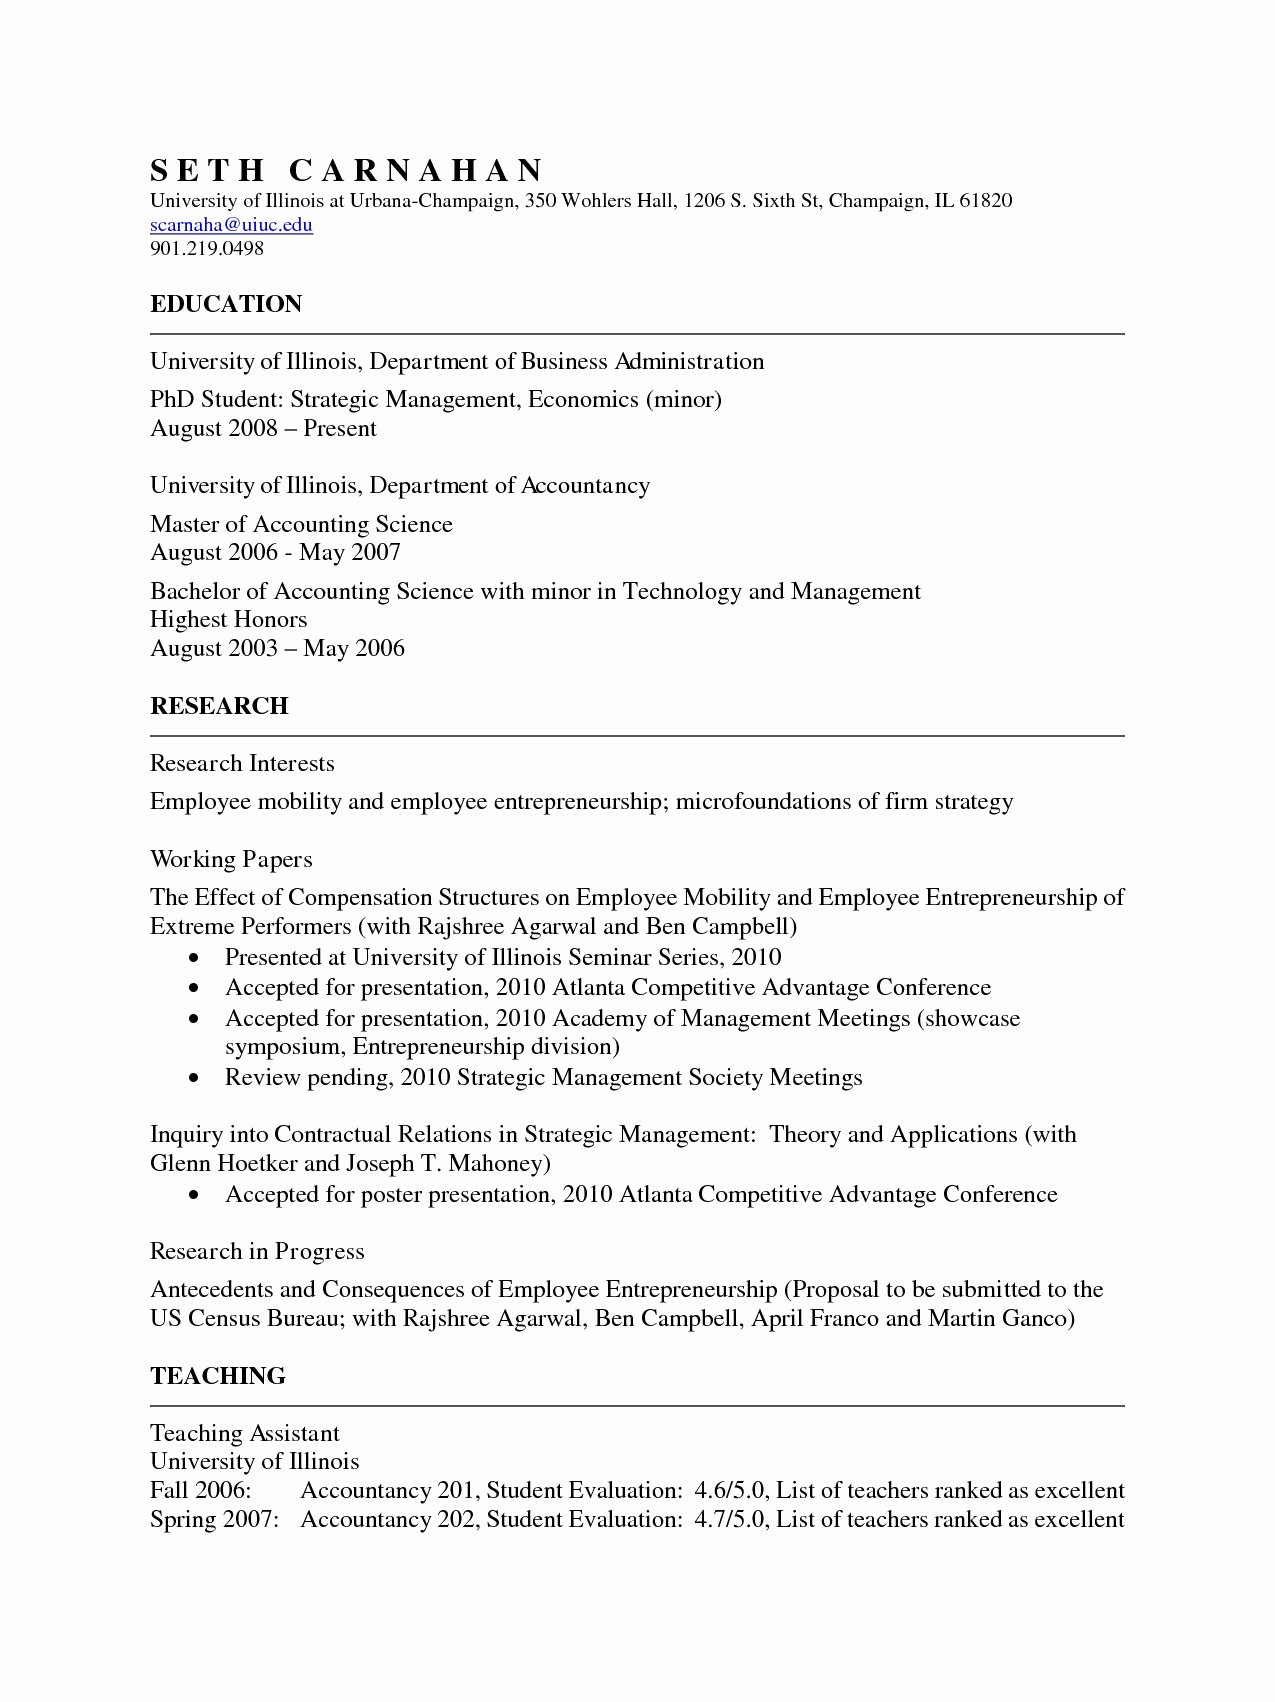 Undergraduate Resume Template Word Best Of Cv format for Australian Universities All Resume